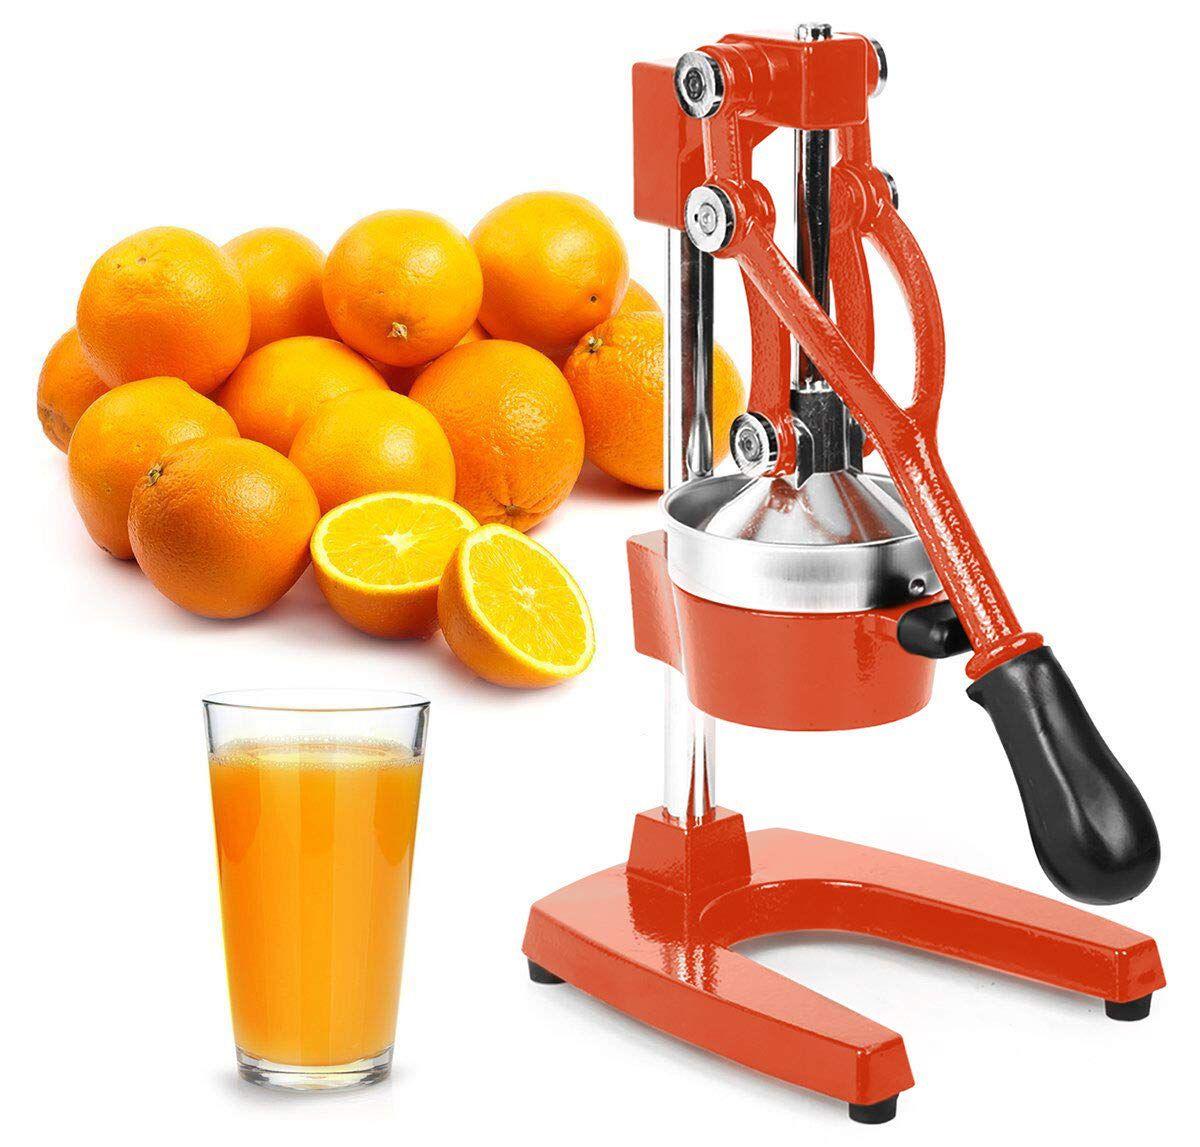 Zulay Kitchen Professional Heavy Duty Citrus Juicer